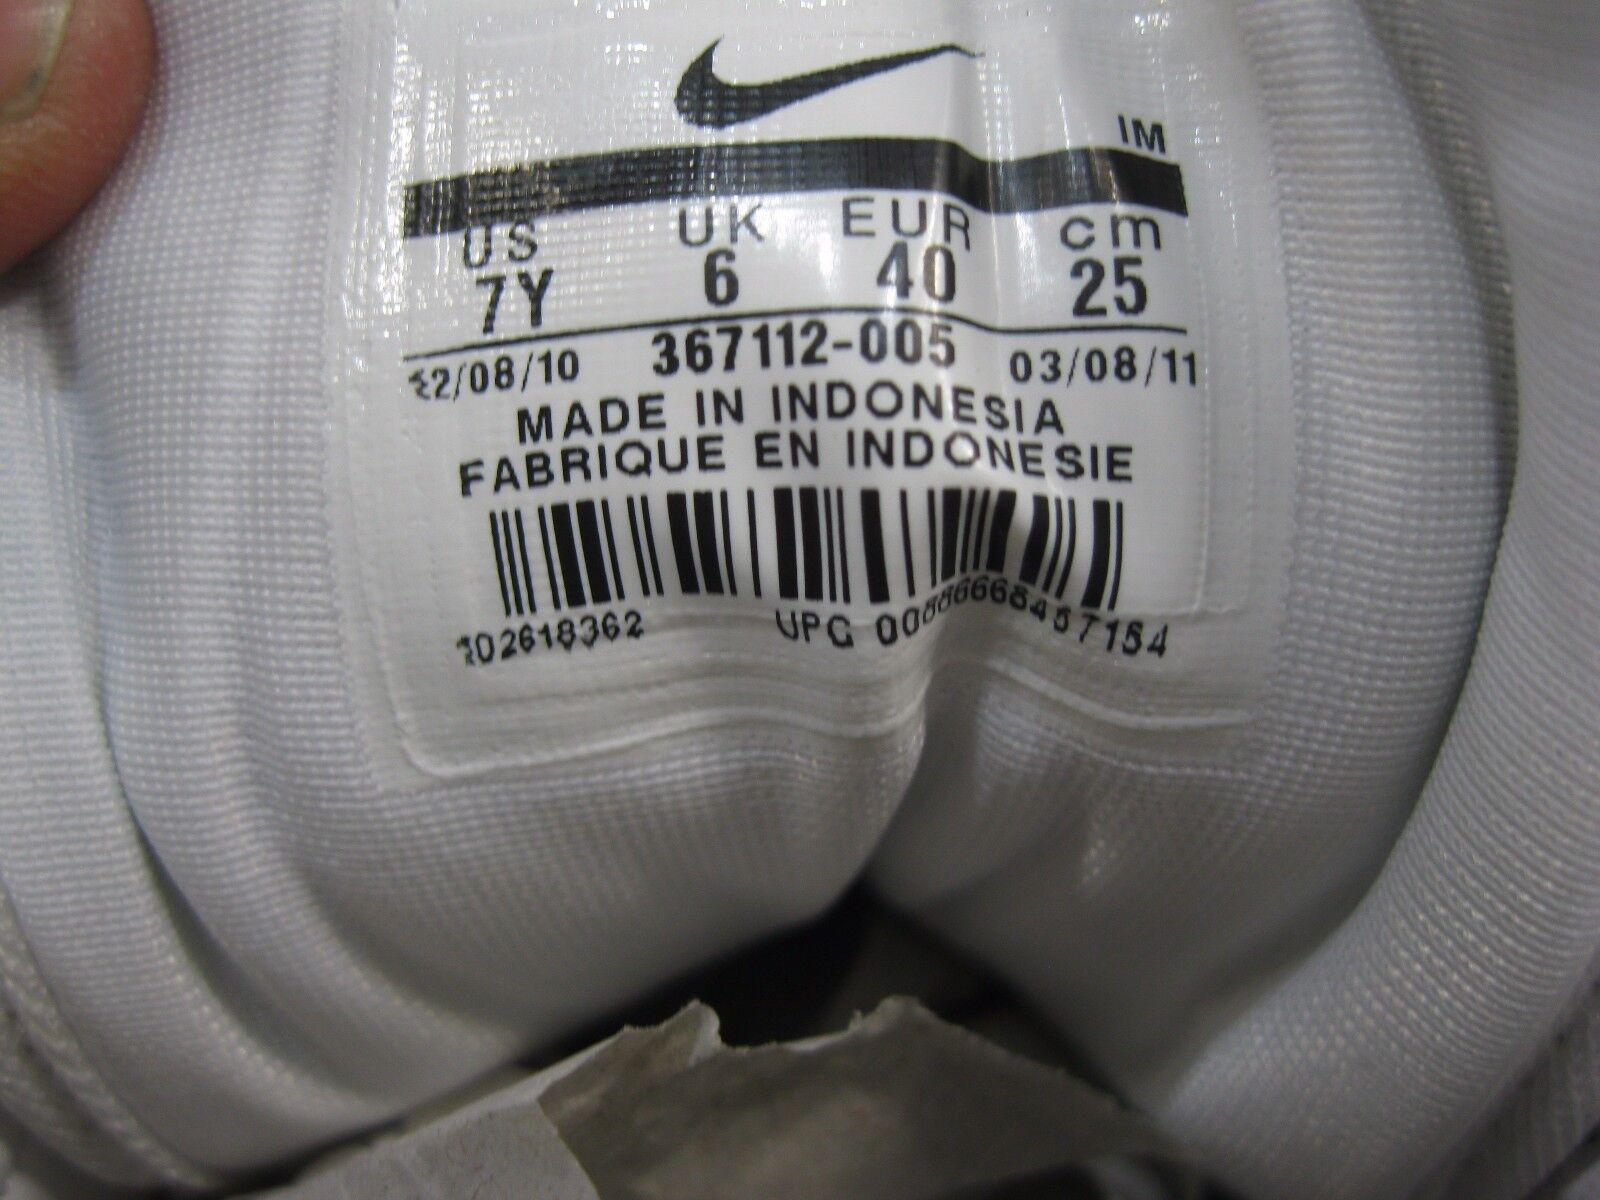 Nike PS Dulce Classic Alto Gs / PS Nike negro/Profundo Real - Blanco 367112 005 TALLA 7 d473b8